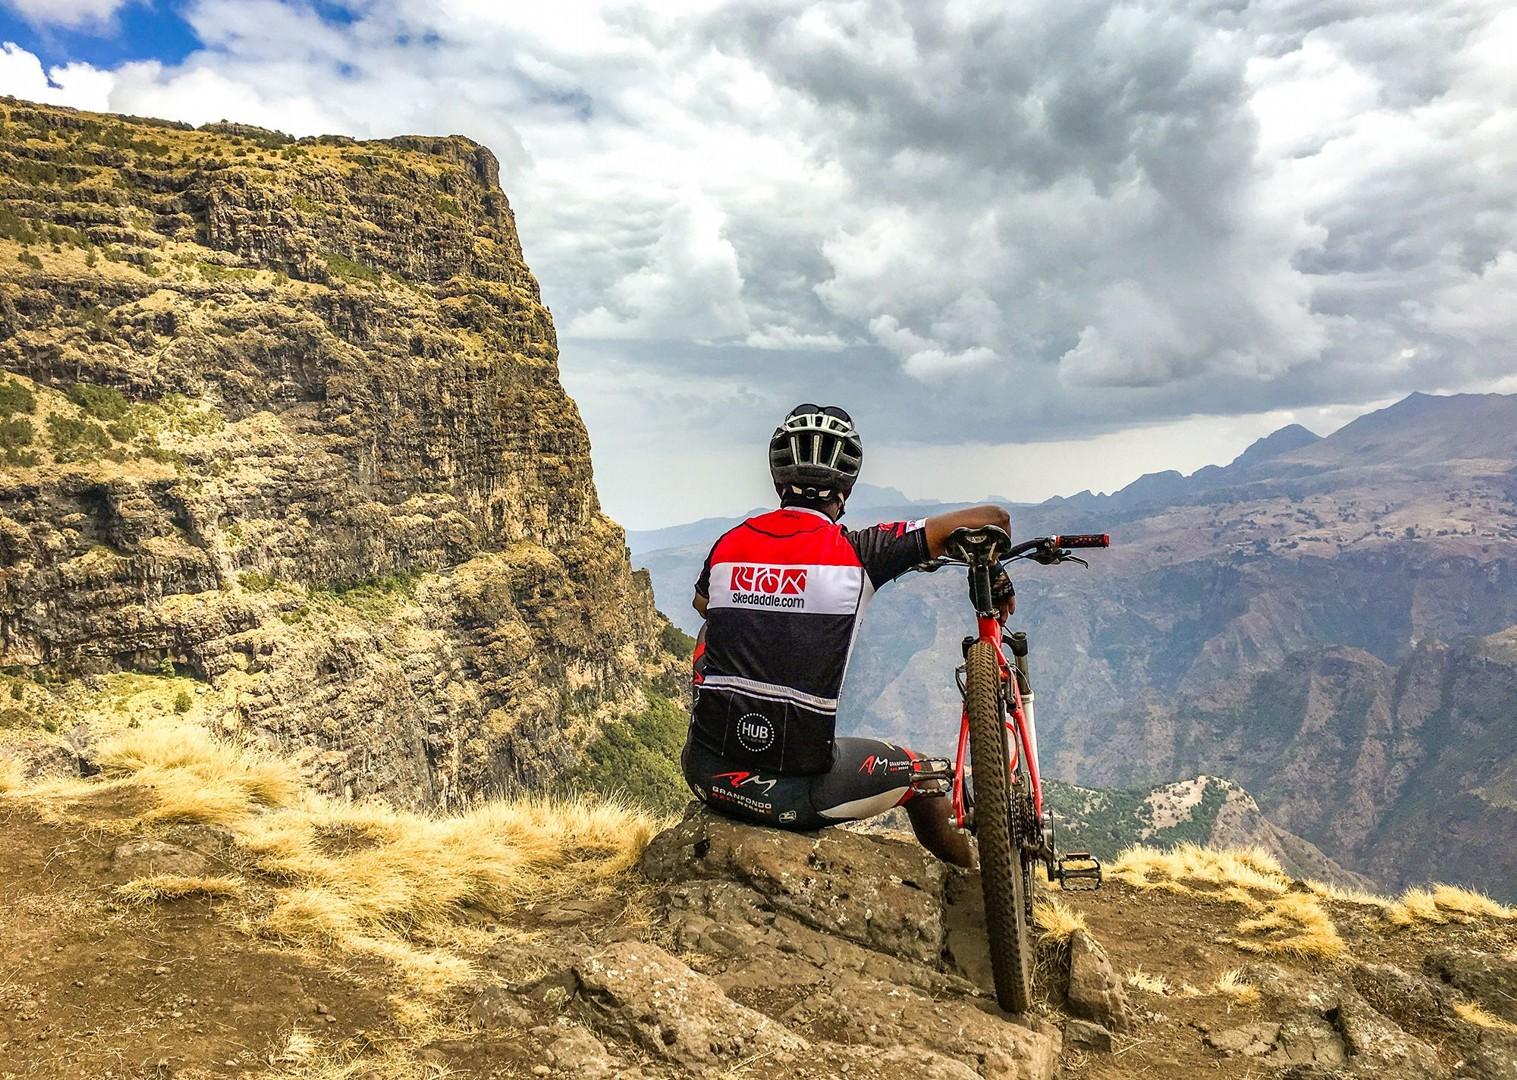 IMG_4801.jpg - NEW! Ethiopia - Enchanting Ethiopia - Cycling Adventures